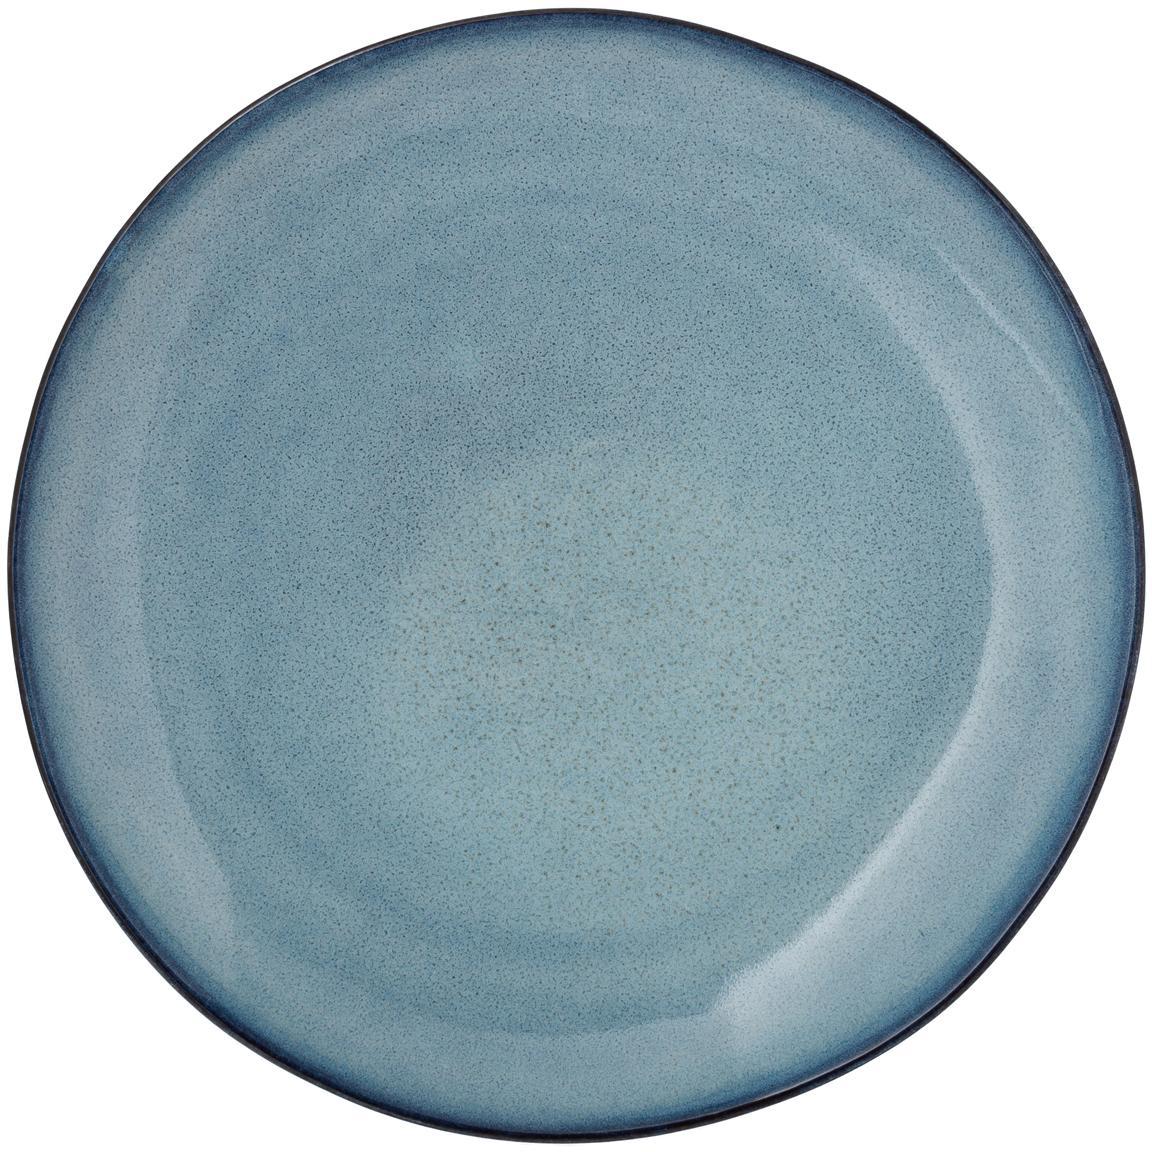 Piatto piano fatto a mano blu Sandrine, Ceramica, Tonalità blu, Ø 22 x Alt. 2 cm